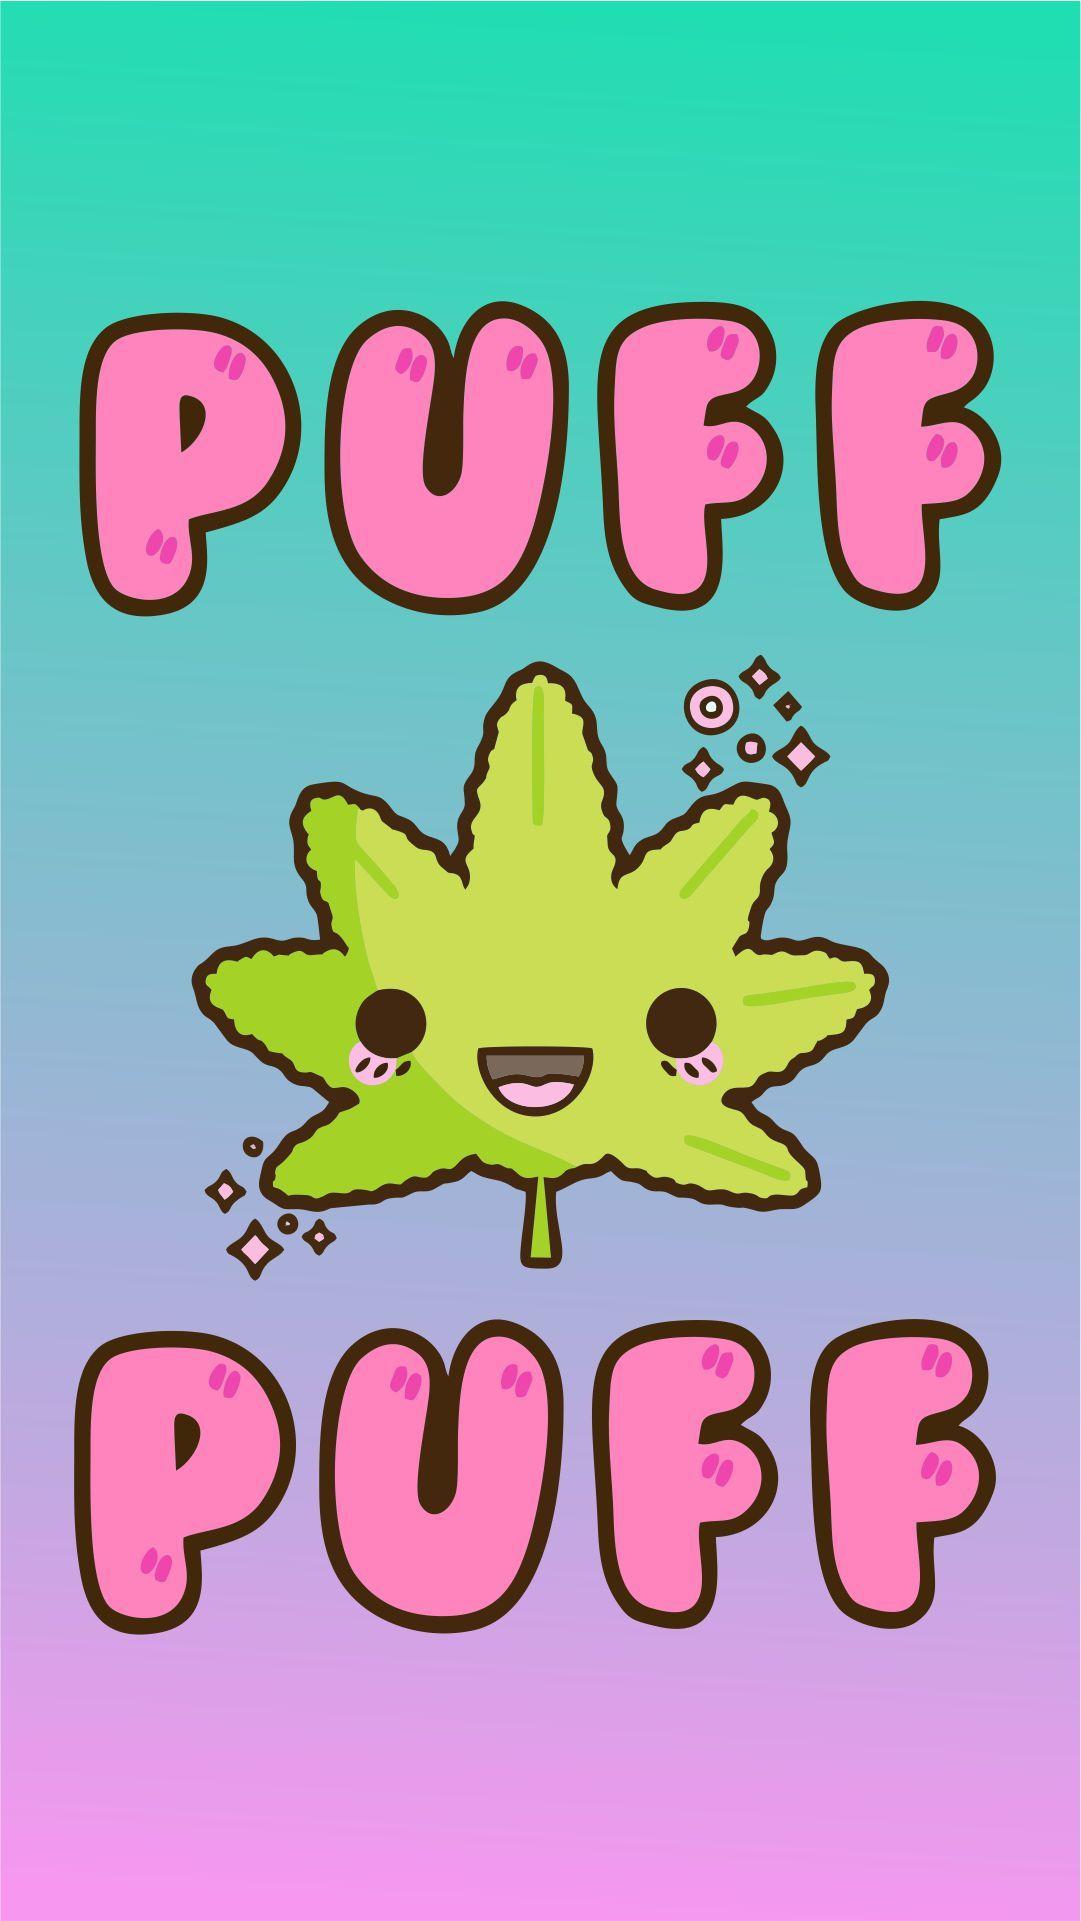 Puff Puff Marijuana Kawaii Loves♥ Pinterest